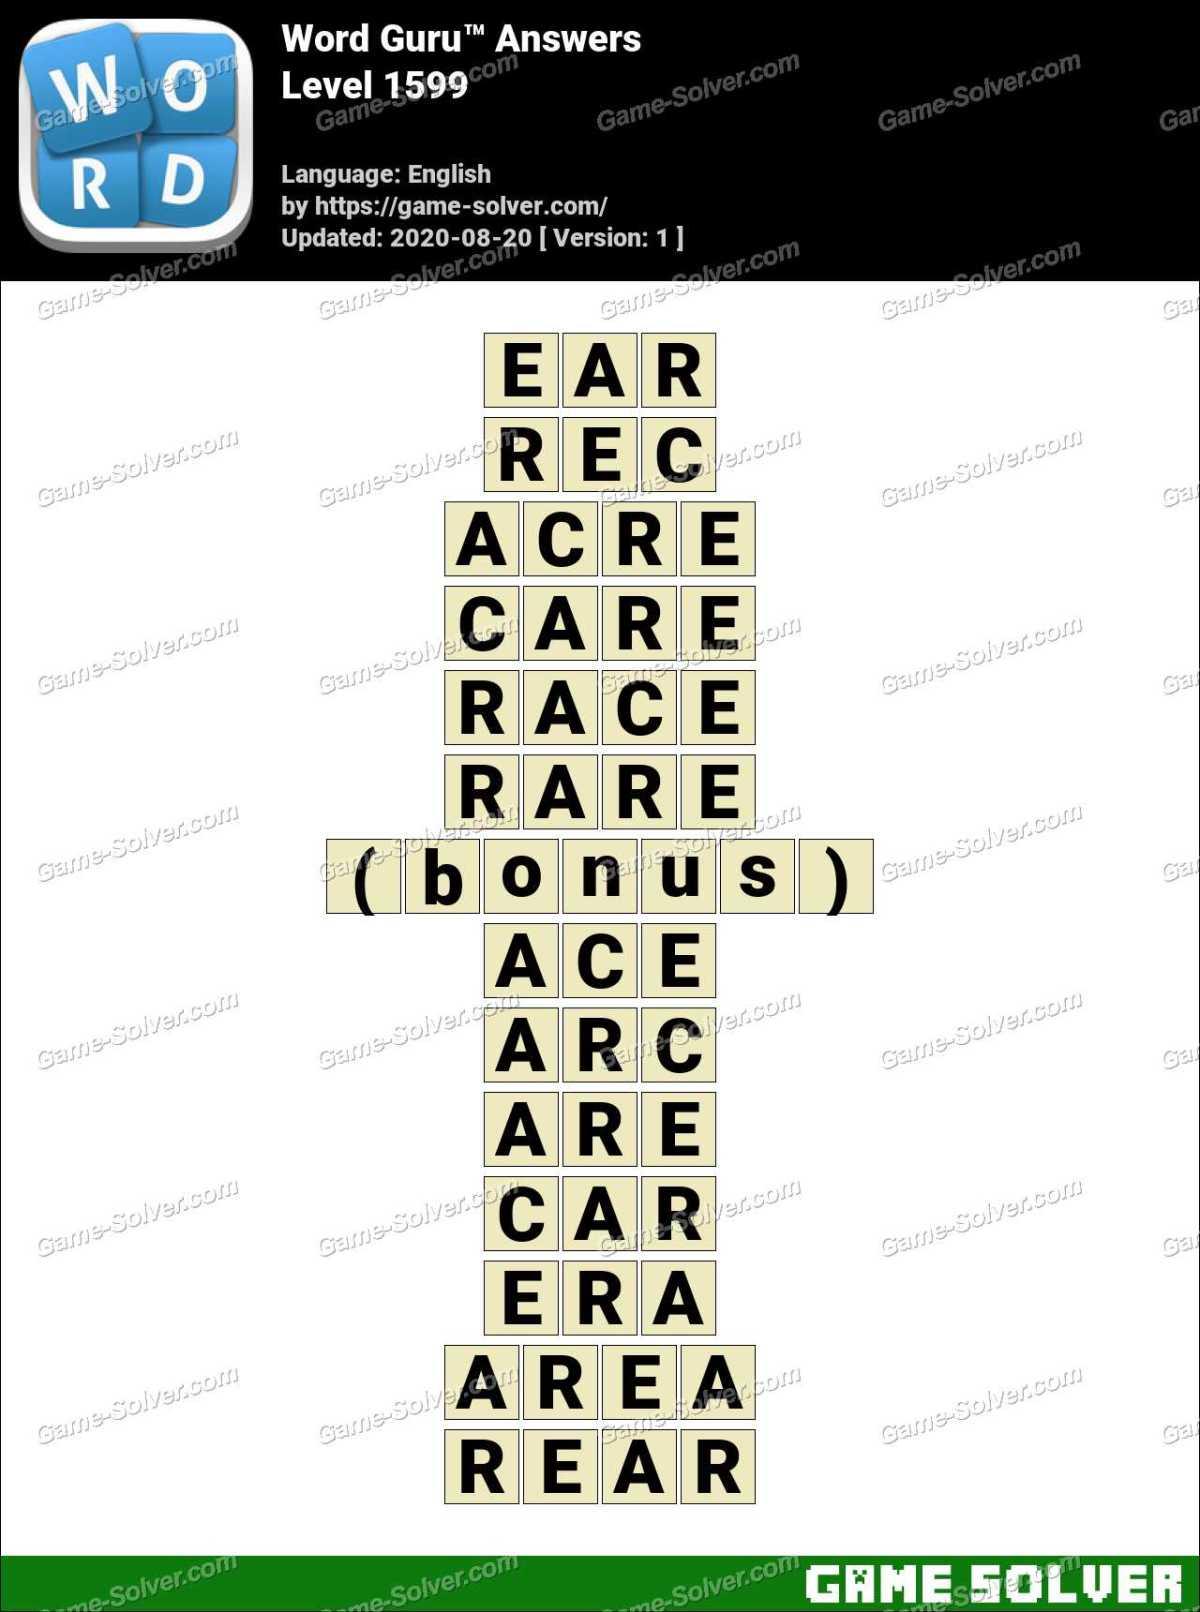 Word Guru Level 1599 Answers